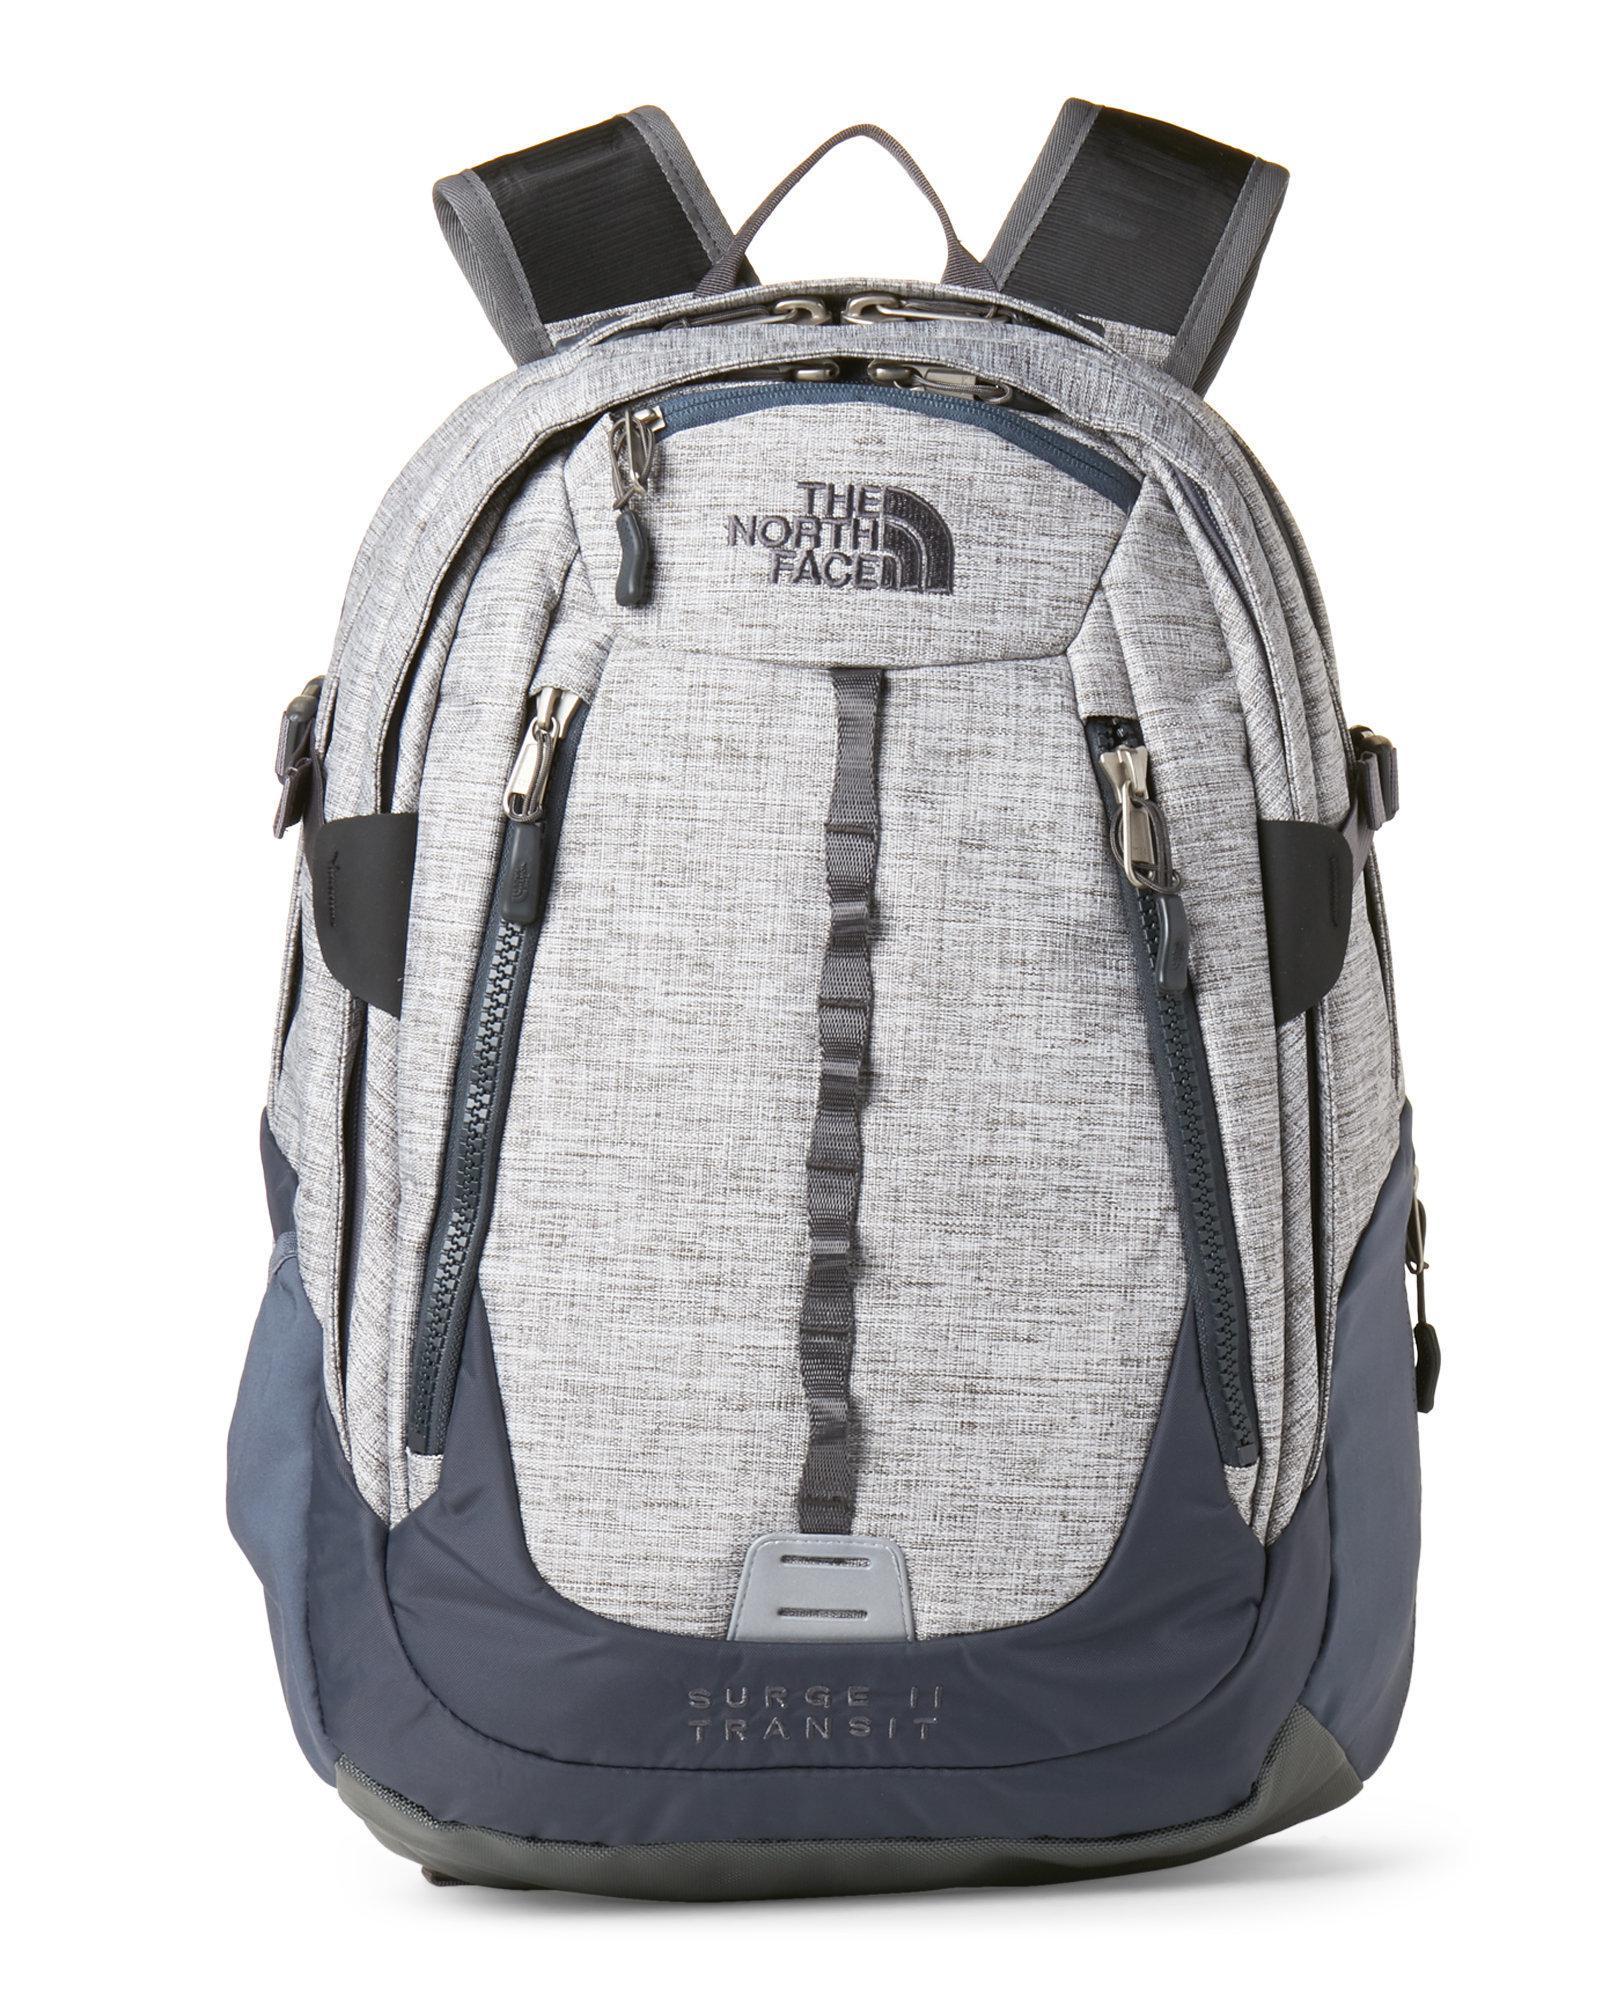 e546d46a76e4 North Face Pandora Classic Backpack- Fenix Toulouse Handball